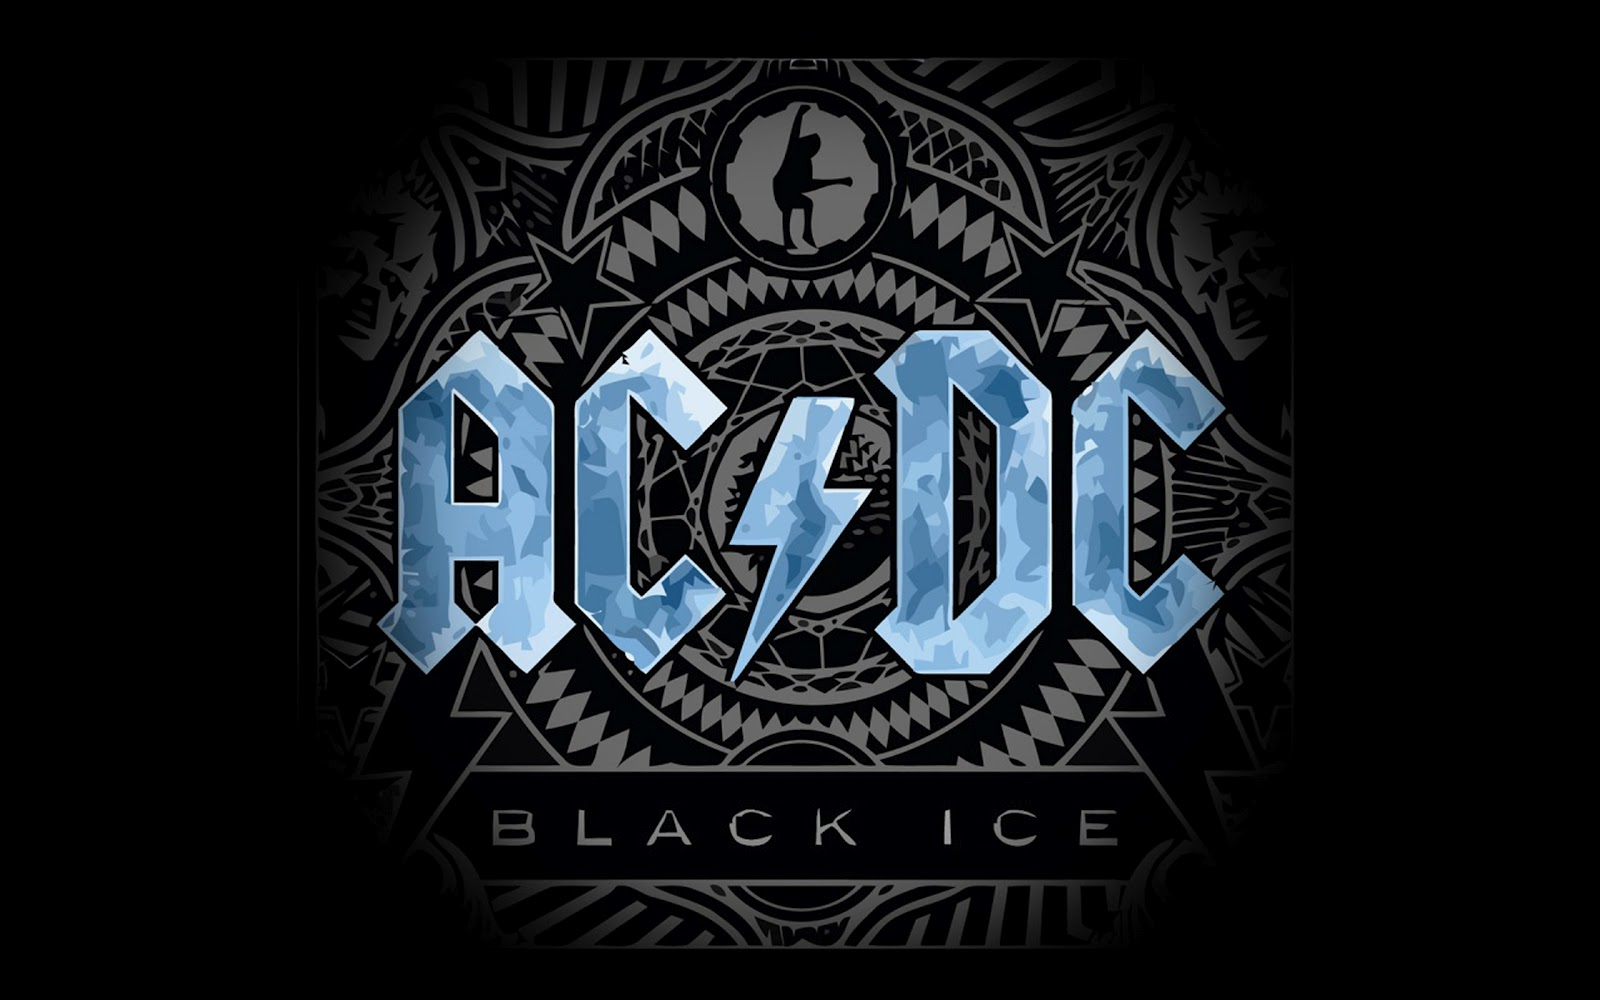 http://3.bp.blogspot.com/-BiOMH97Bn70/T-m8KP8-PTI/AAAAAAAAAq4/jwoSPzAjnus/s1600/music_classic_rock_ac_dc_black_ice_wallpaper+-+2560+x+1600+px.jpg